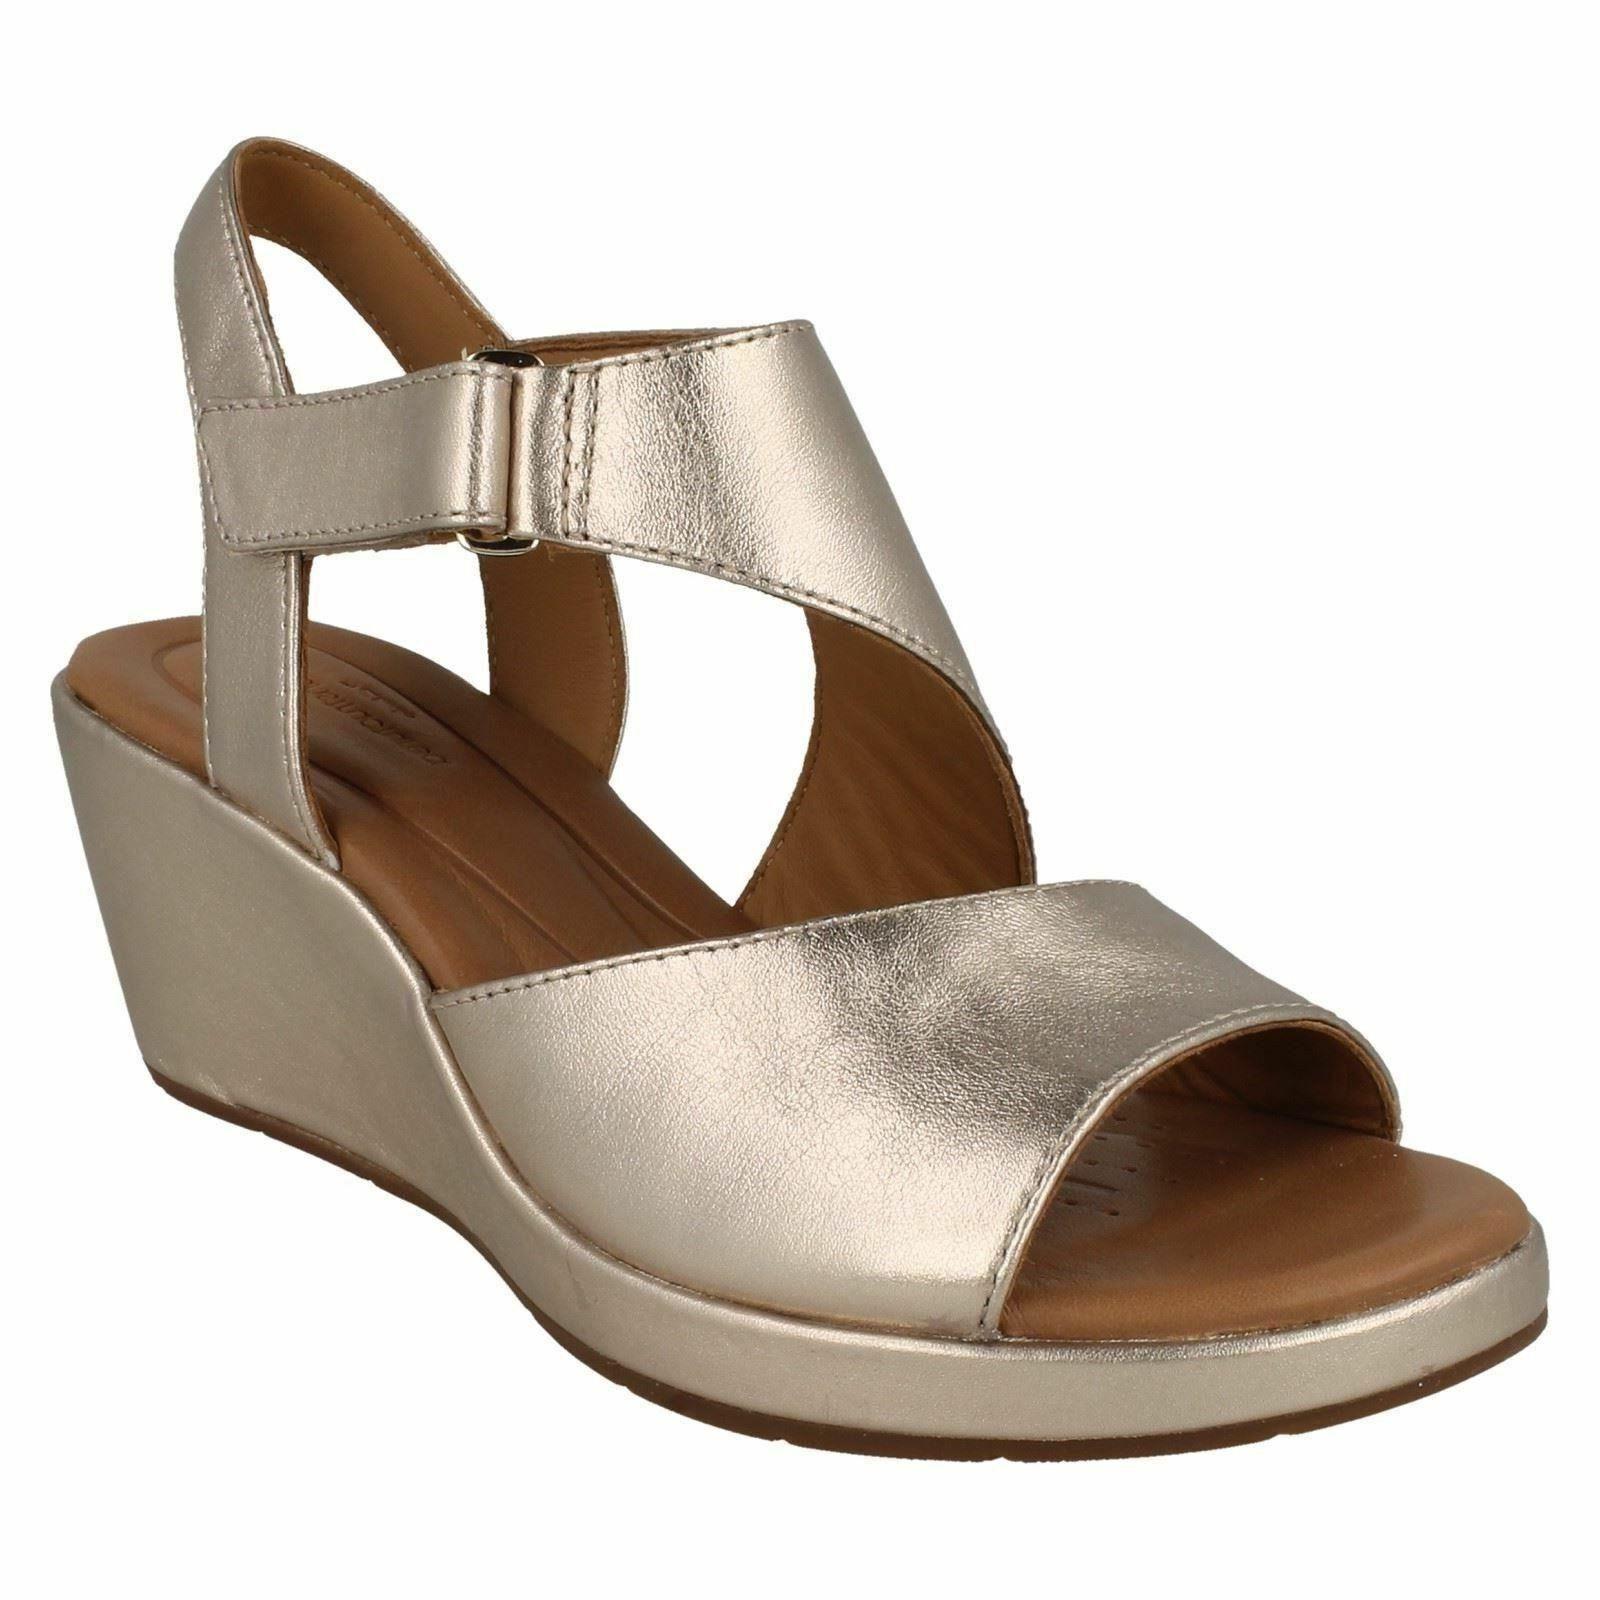 6ee017fdf2b0 Clarks Un Plaza Sling - Gold Metallic (leather) Womens HEELS 8 UK ...